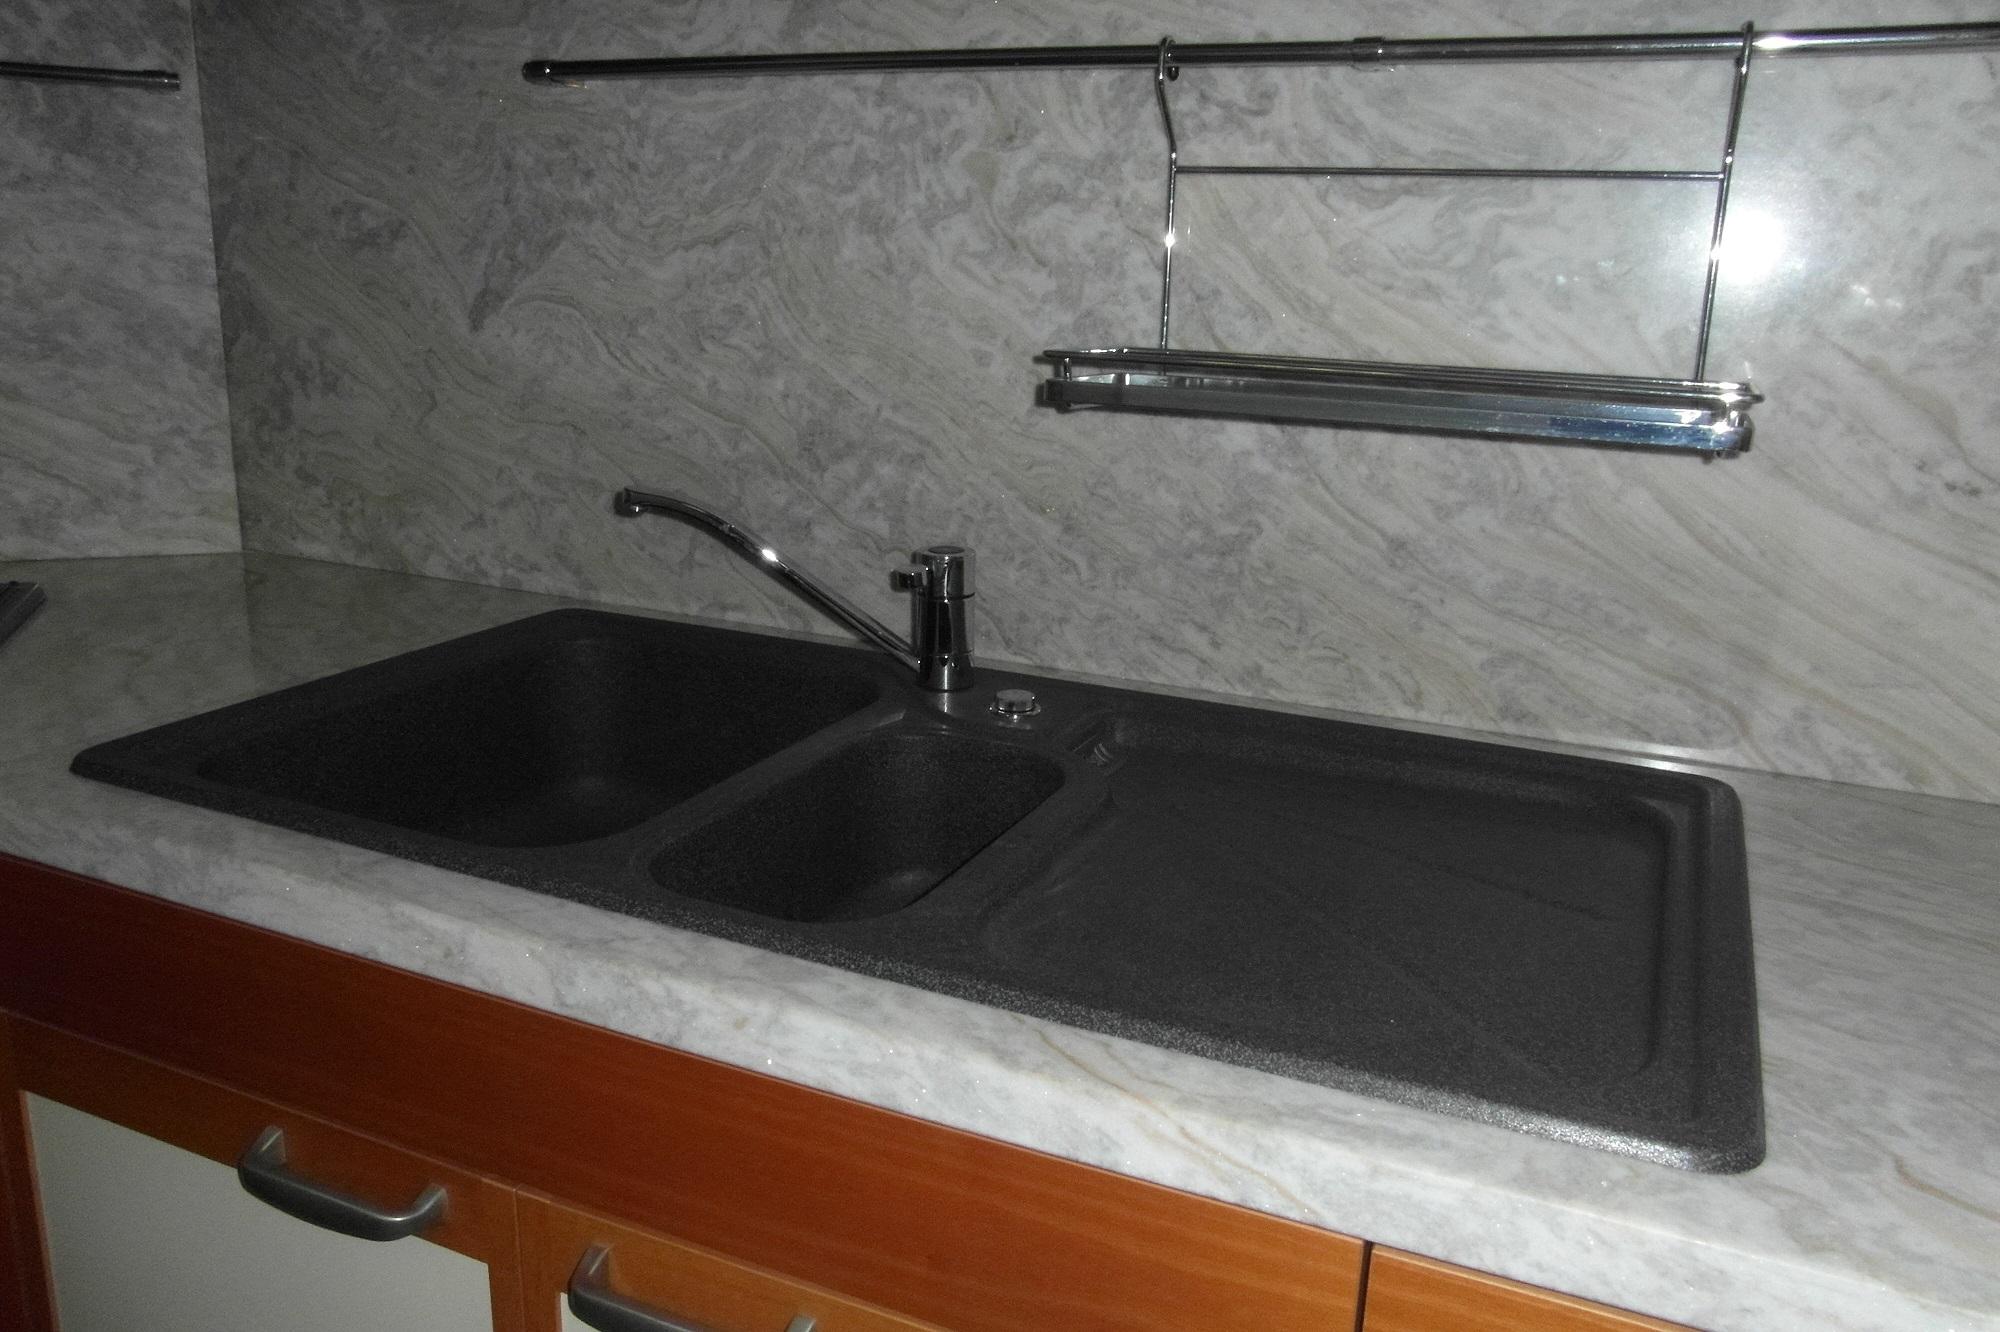 Cucina dada in noce schienale e top in marmo karibib piano in lamellare di noce cucine a - Top marmo cucina prezzi ...